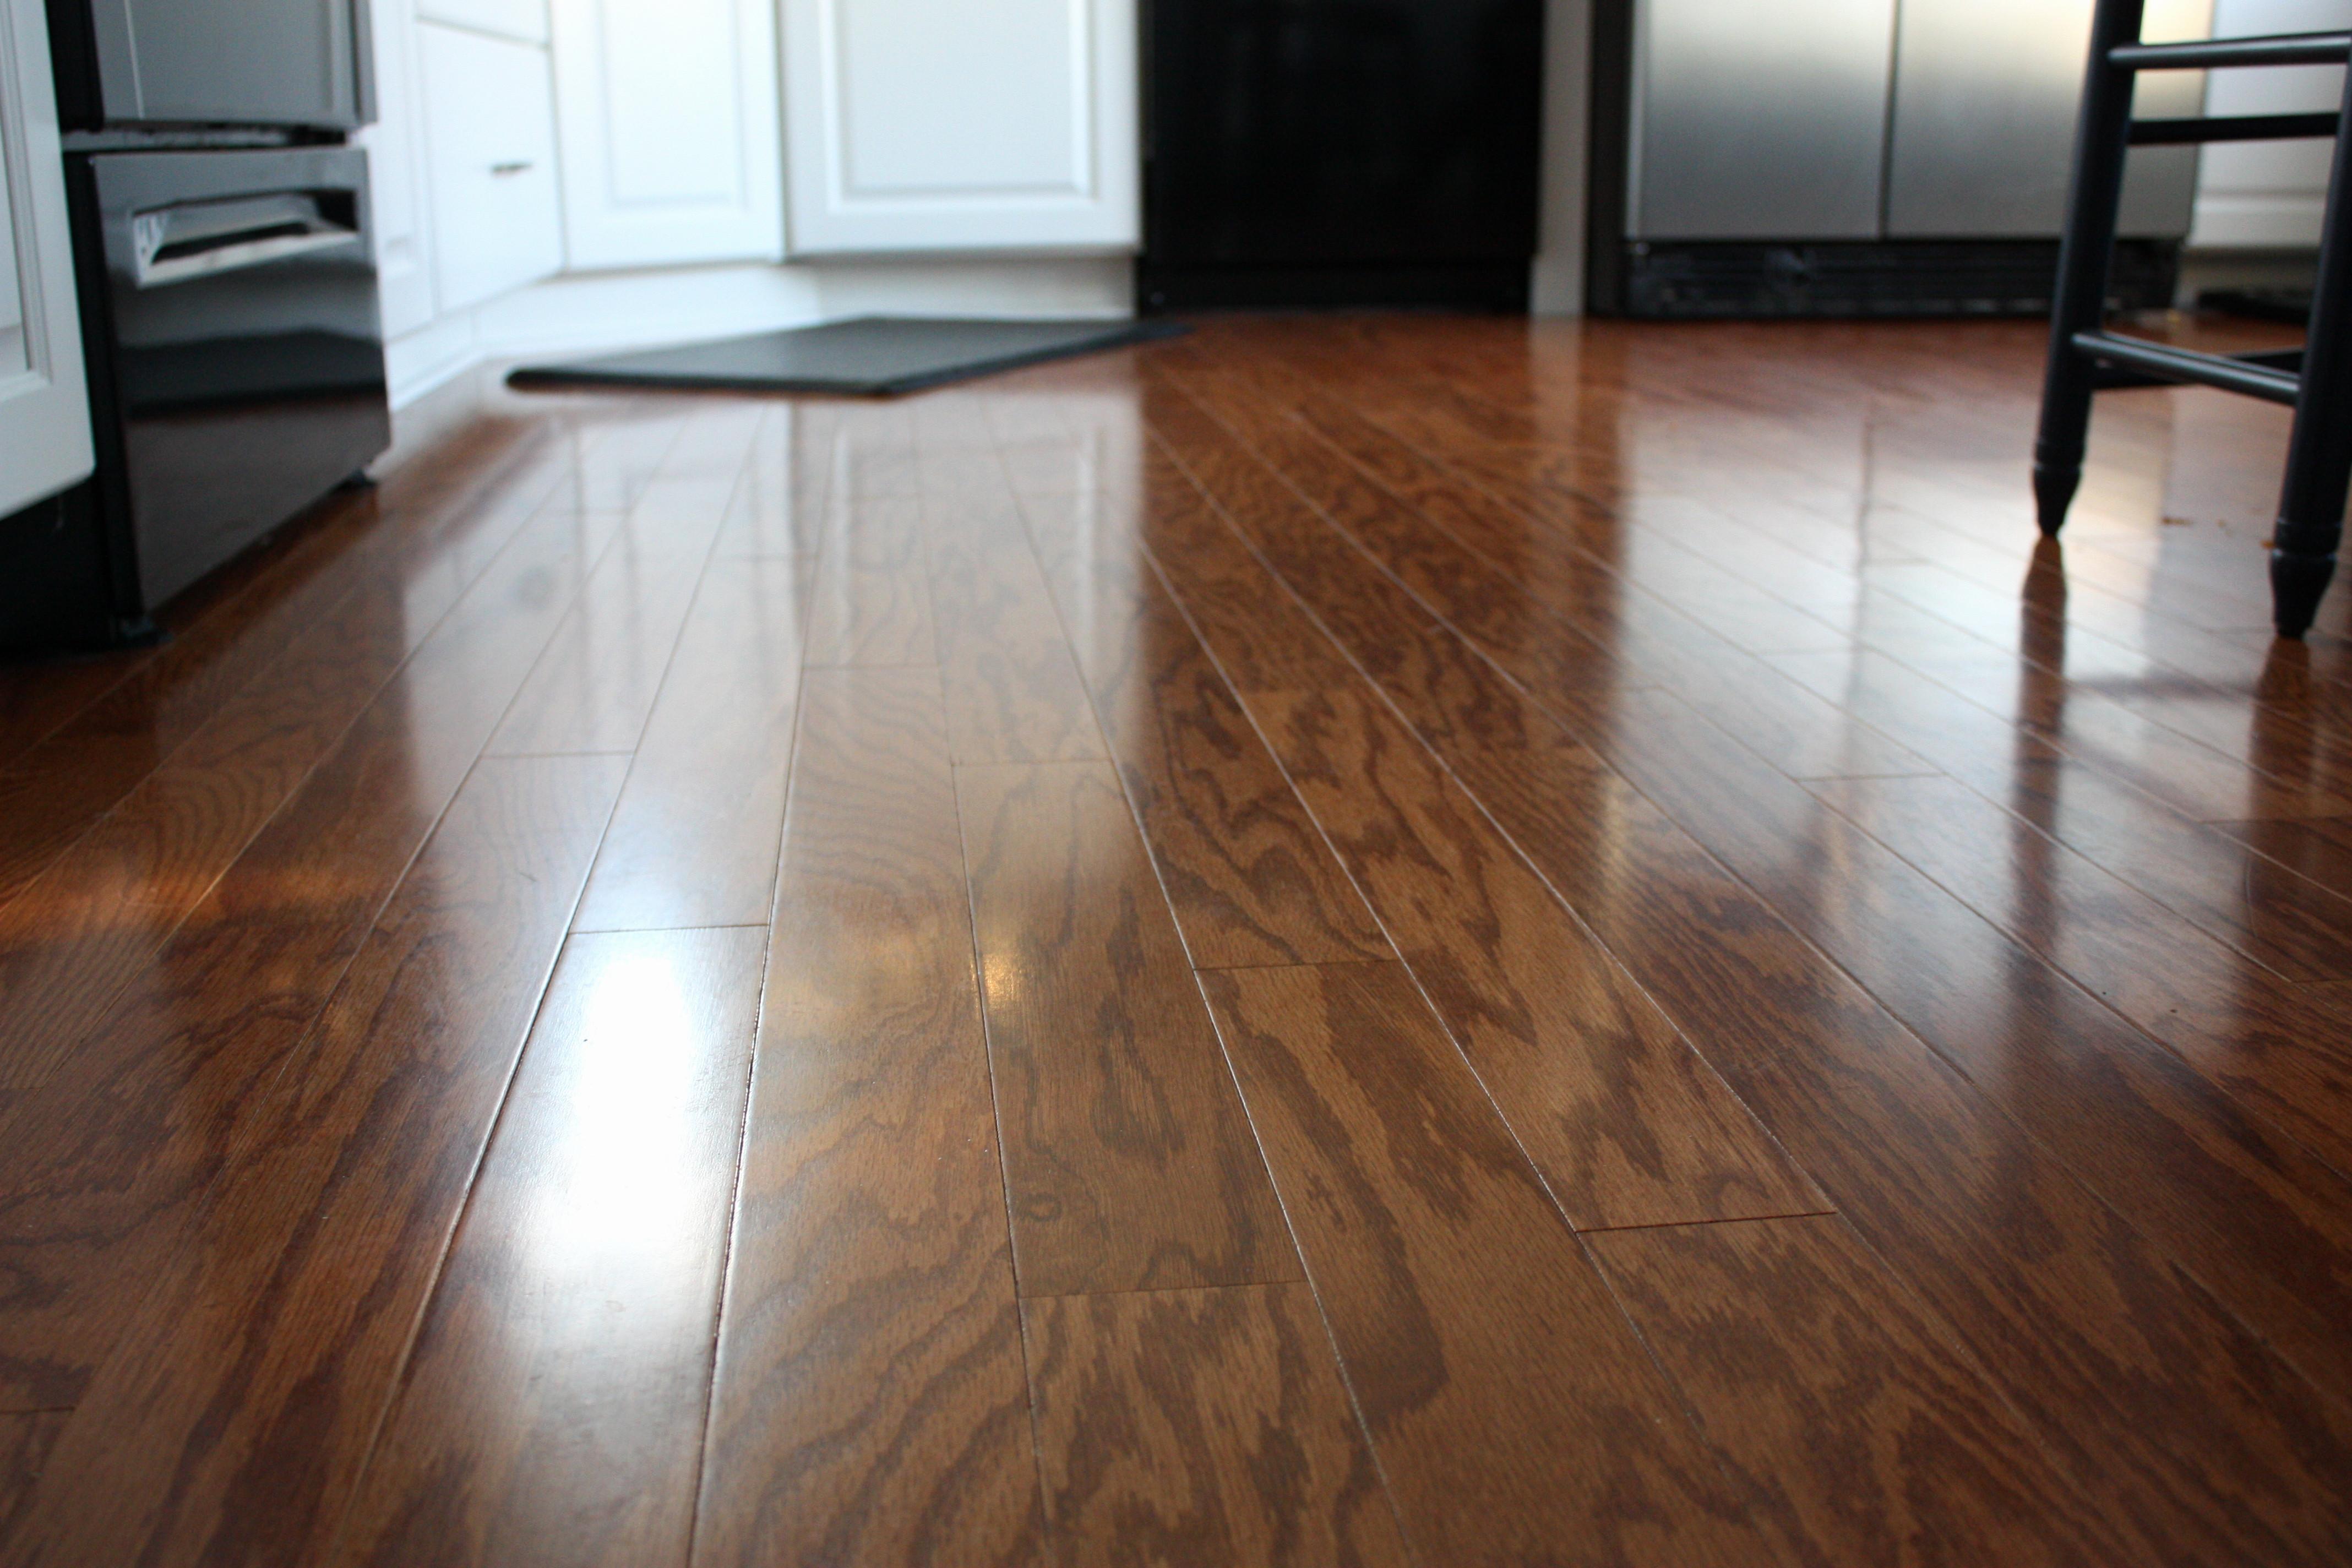 wood filler for hardwood floor repair of the wood maker page 6 wood wallpaper inside floor floorod cleaning hardwood carpet lake forest il rare image ideas of wood floor steam cleaner